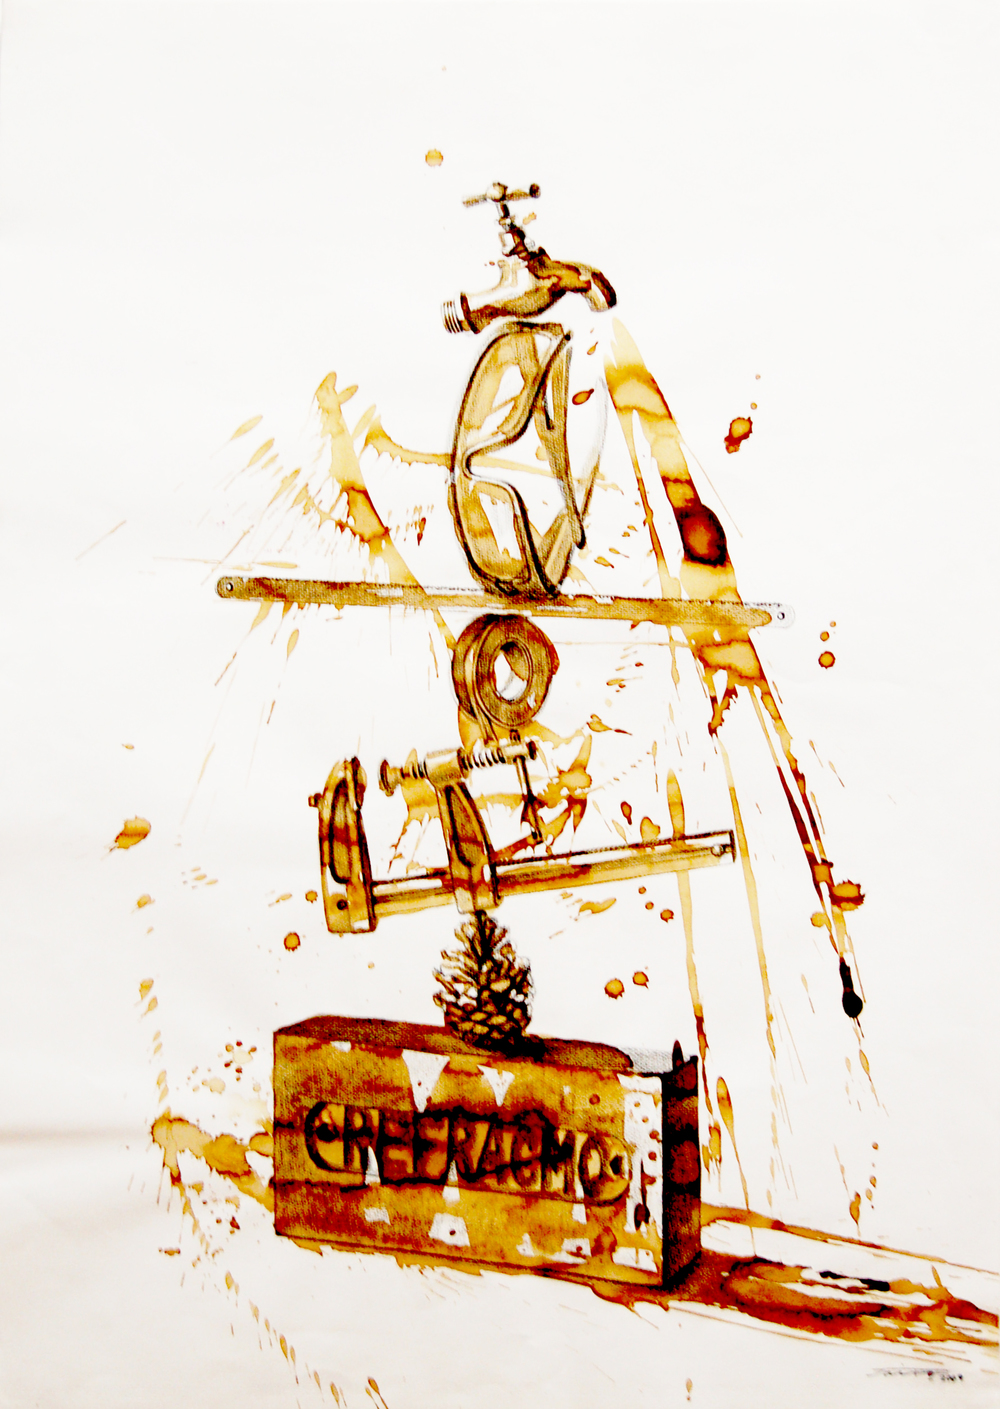 JairoAlfonso,Untitled, Equilibirum Series, Mixed Media on Paper, 2009, 77cm x 55cm